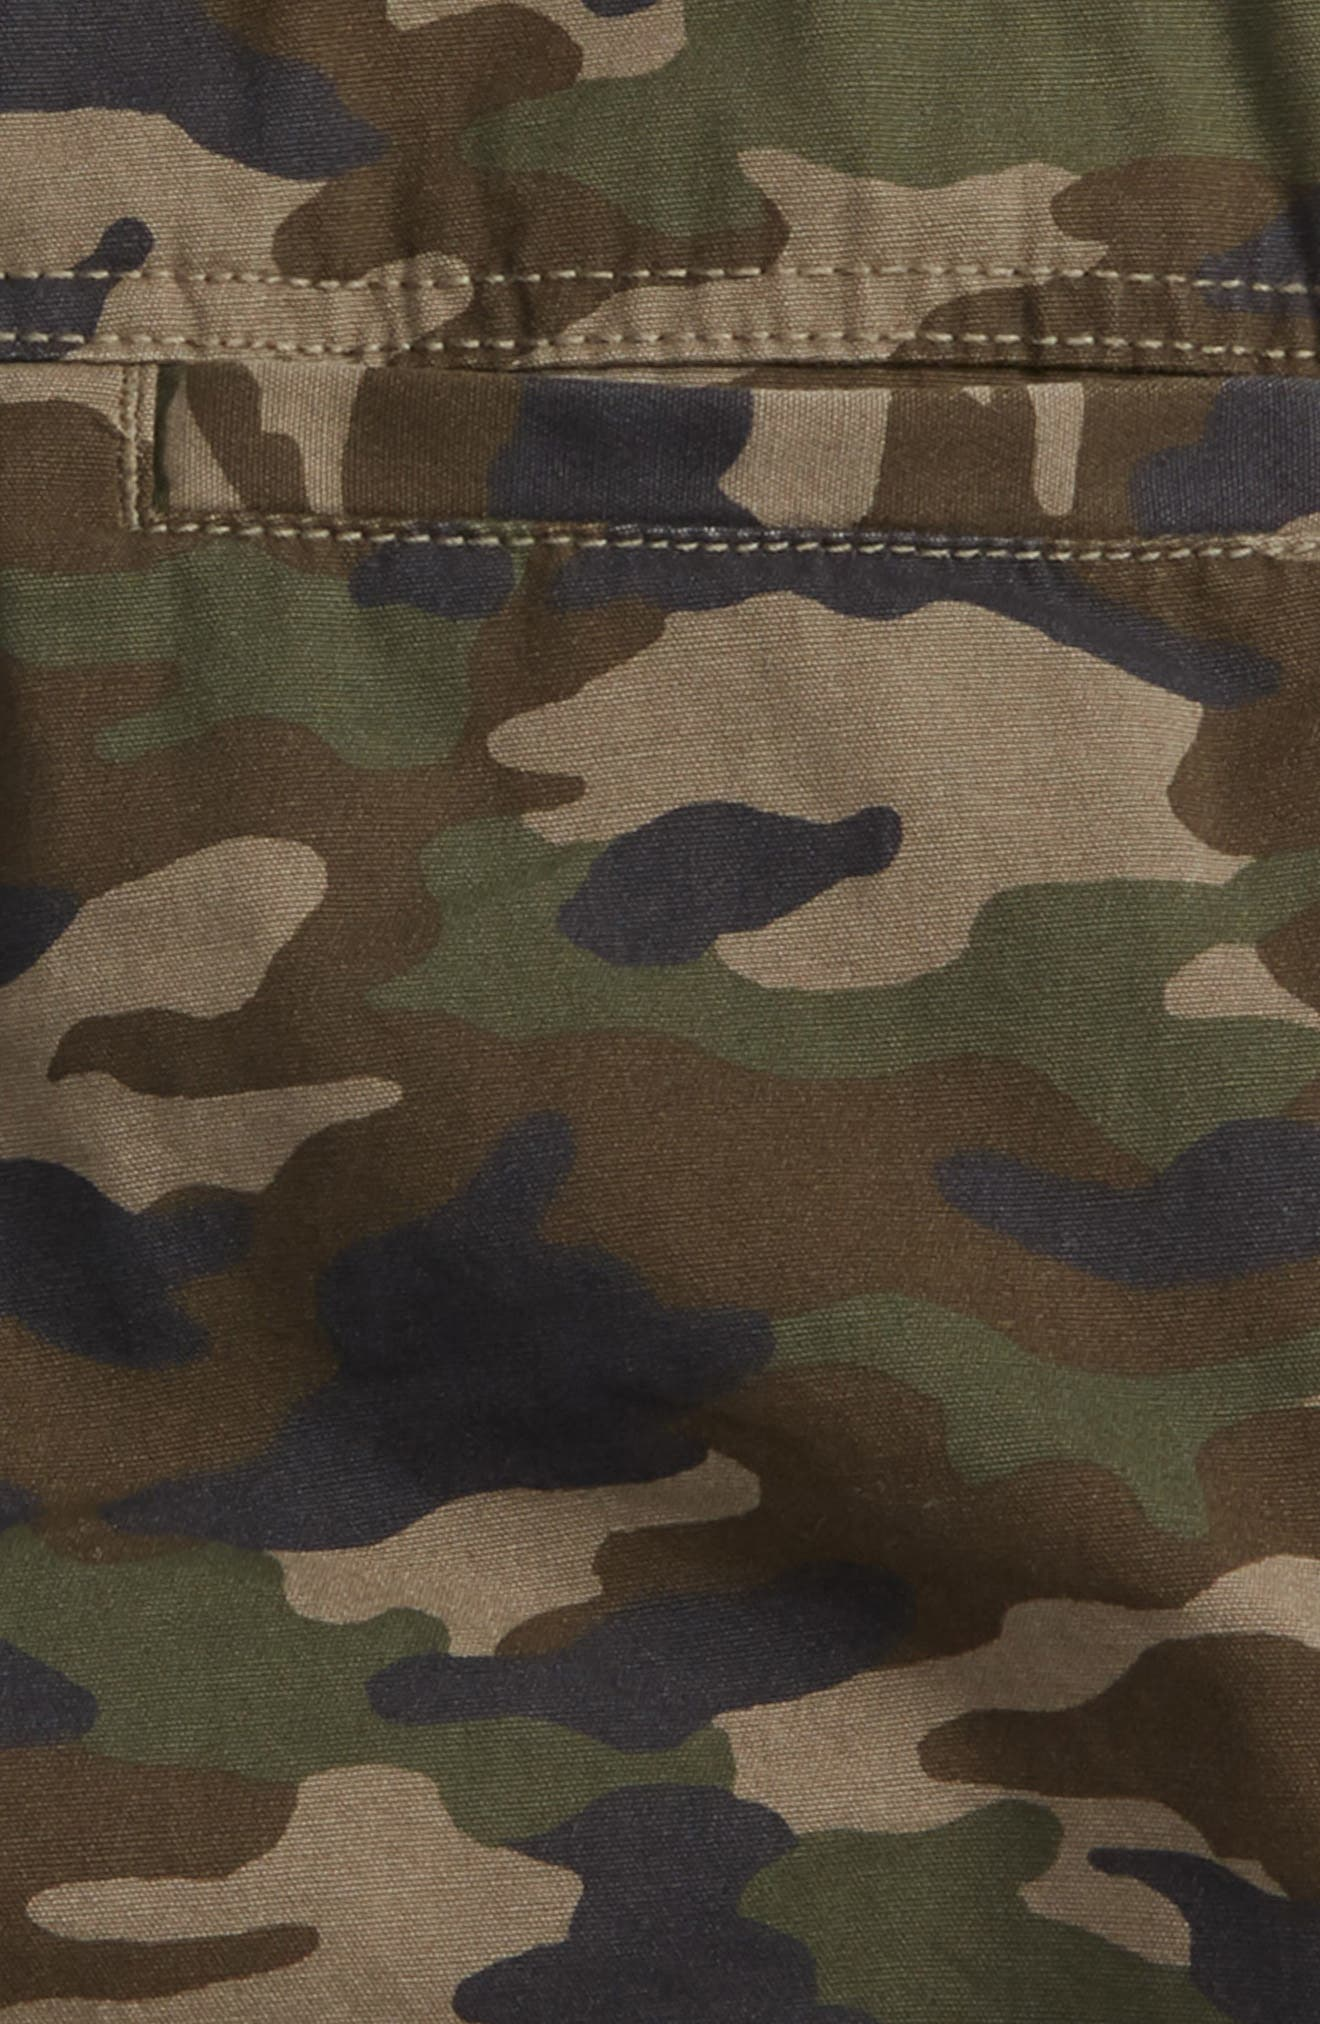 Camo Cargo Shorts,                             Alternate thumbnail 3, color,                             Olive Brown Camo